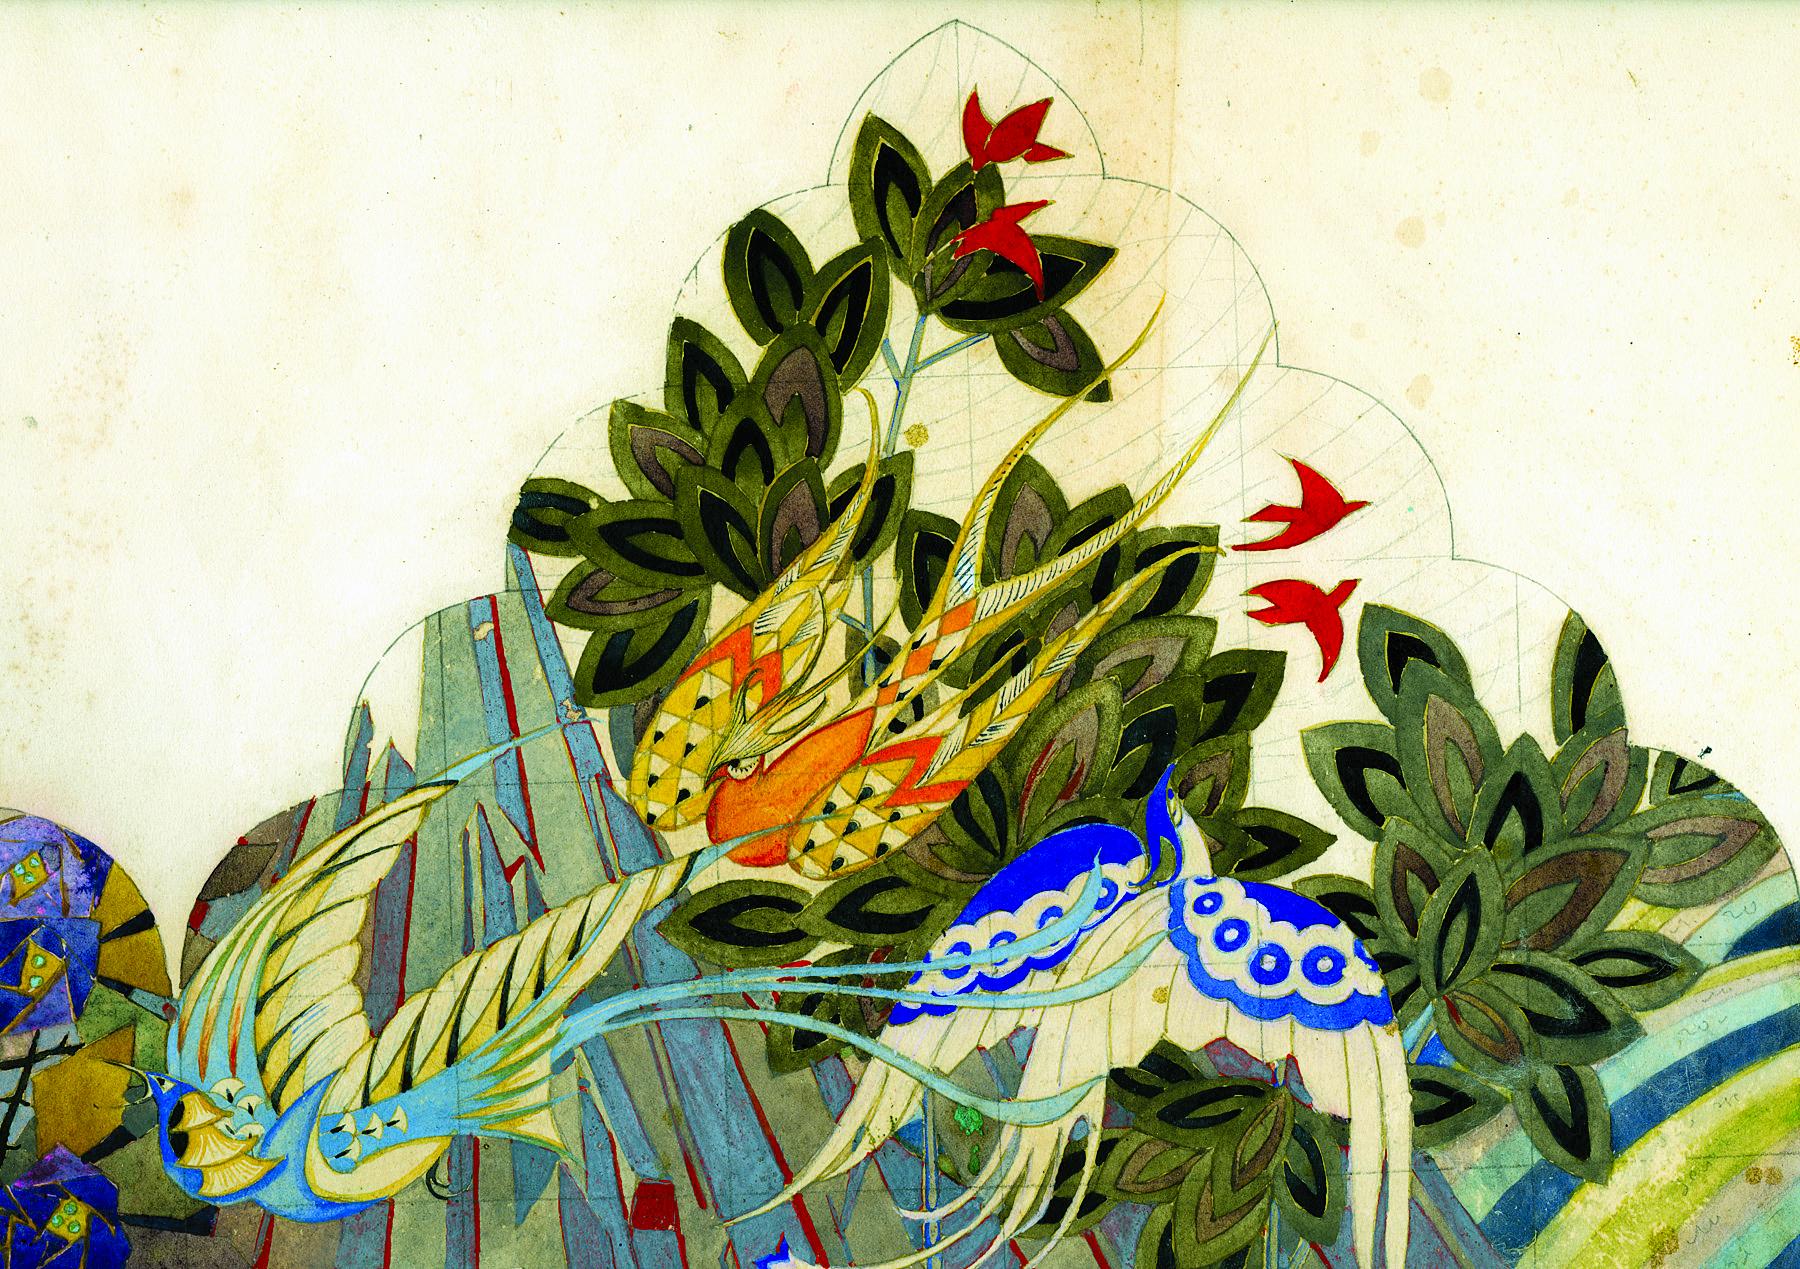 'Fantasy into Art' Exhibit Opens at Catalina Museum